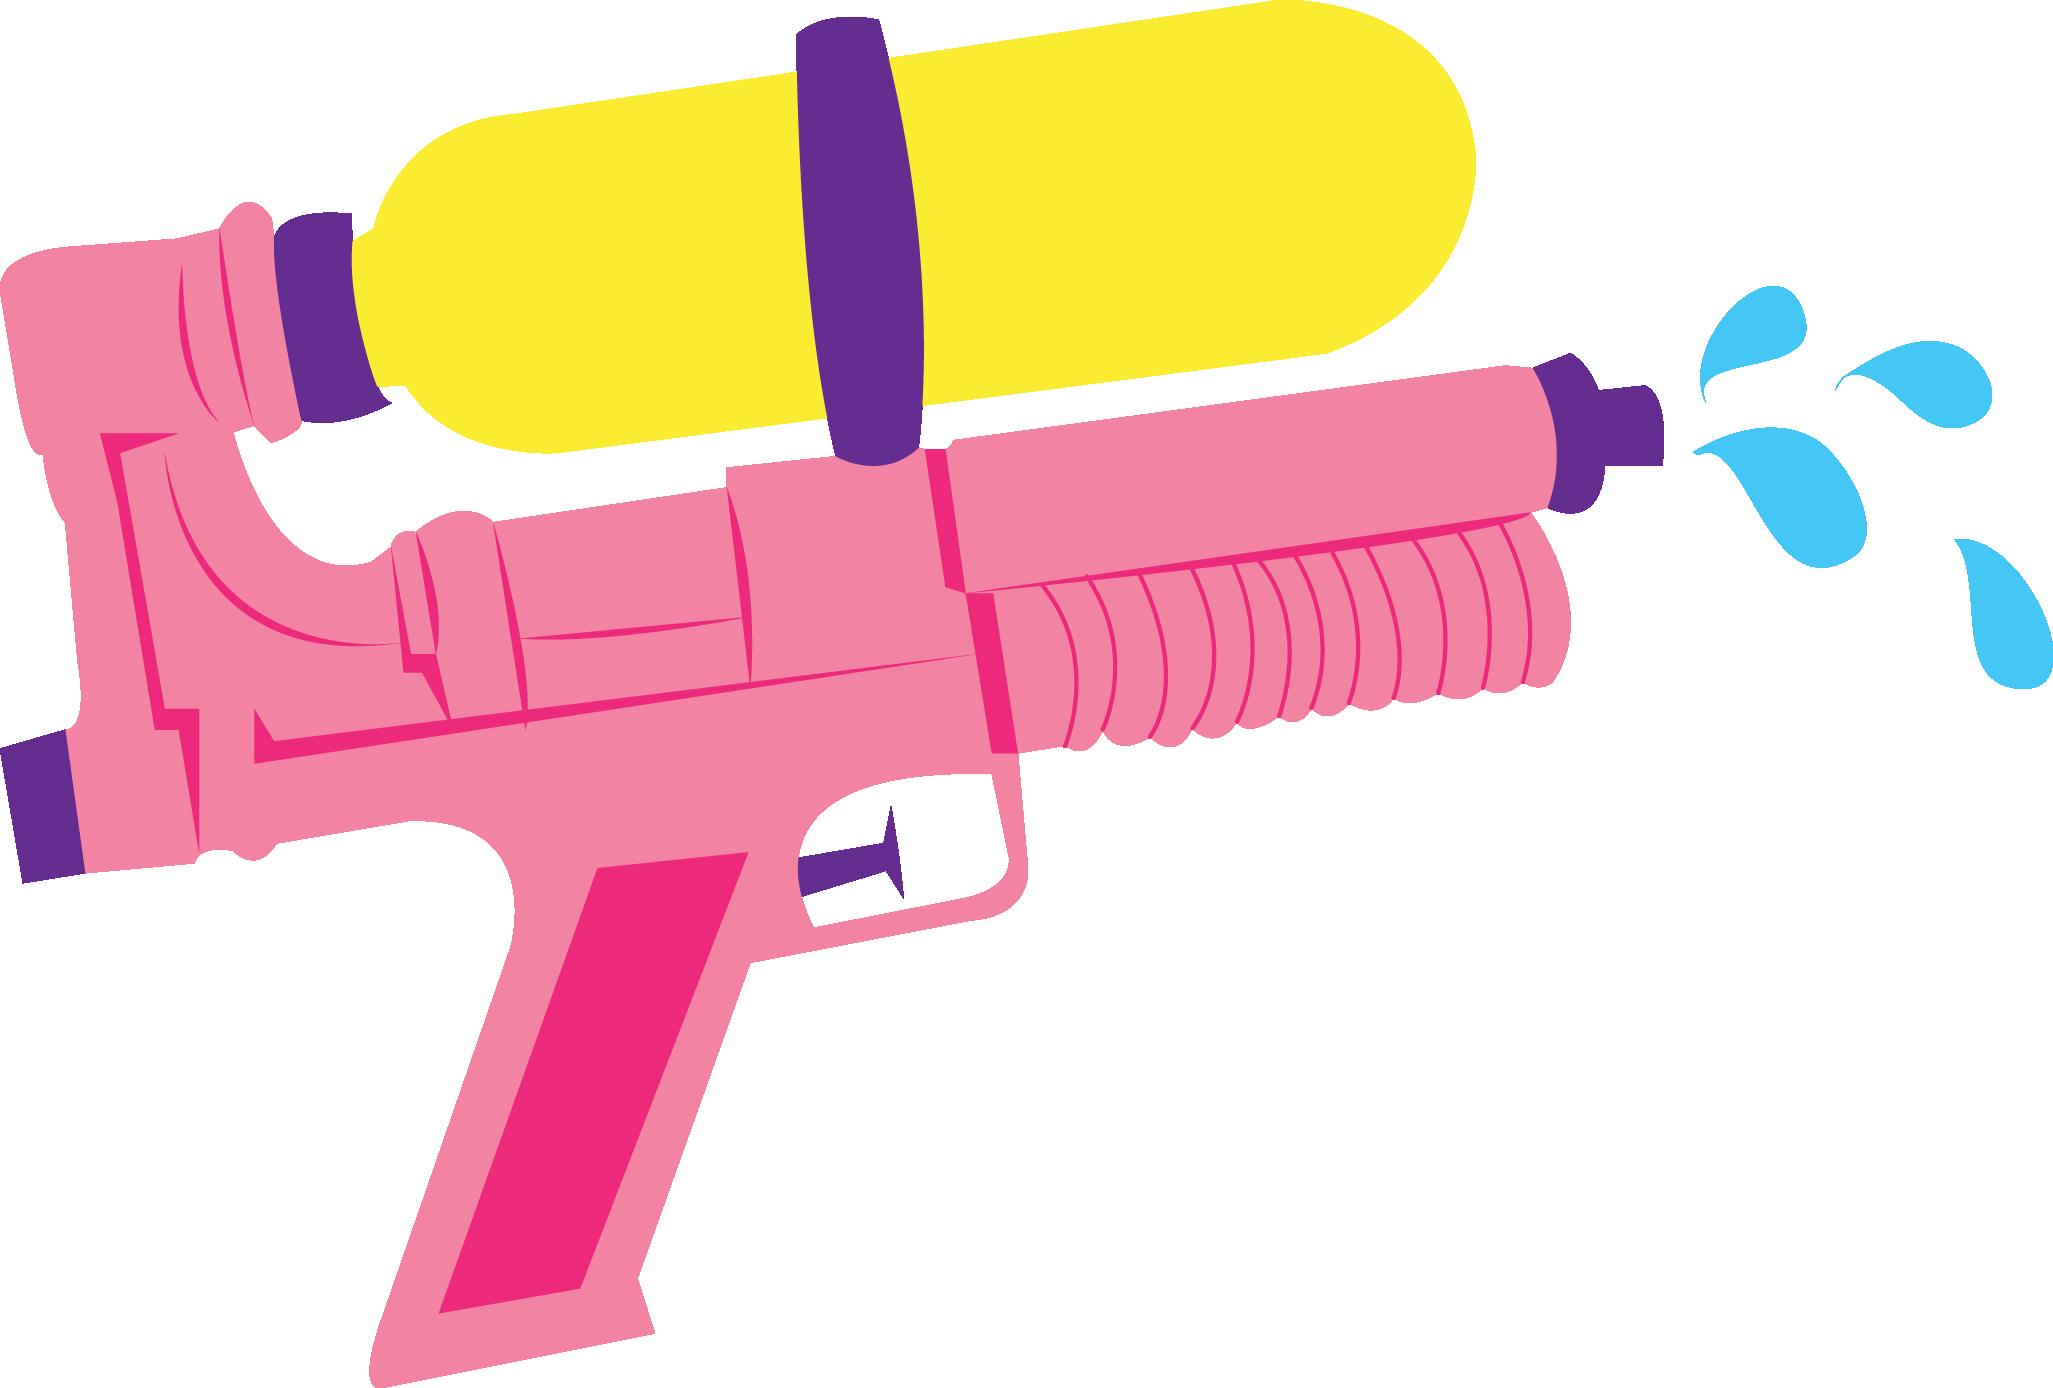 Clipart gun holi. Water firearm toy clip